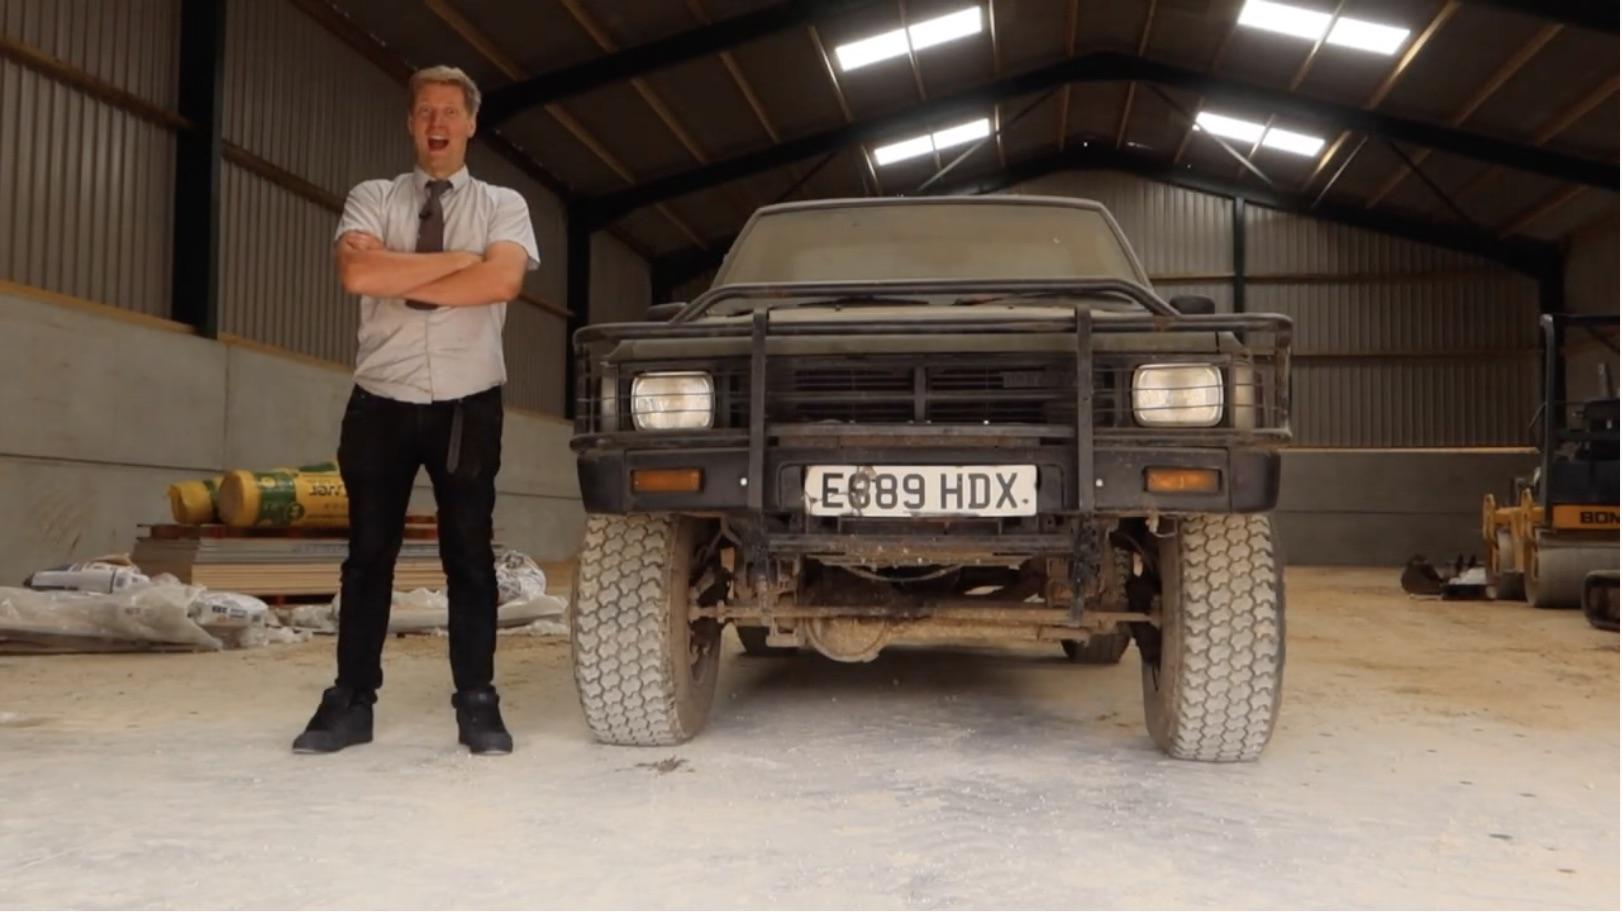 The Maniac's Truck: Go In-Depth Into Colin Furze's 1988 Toyota!